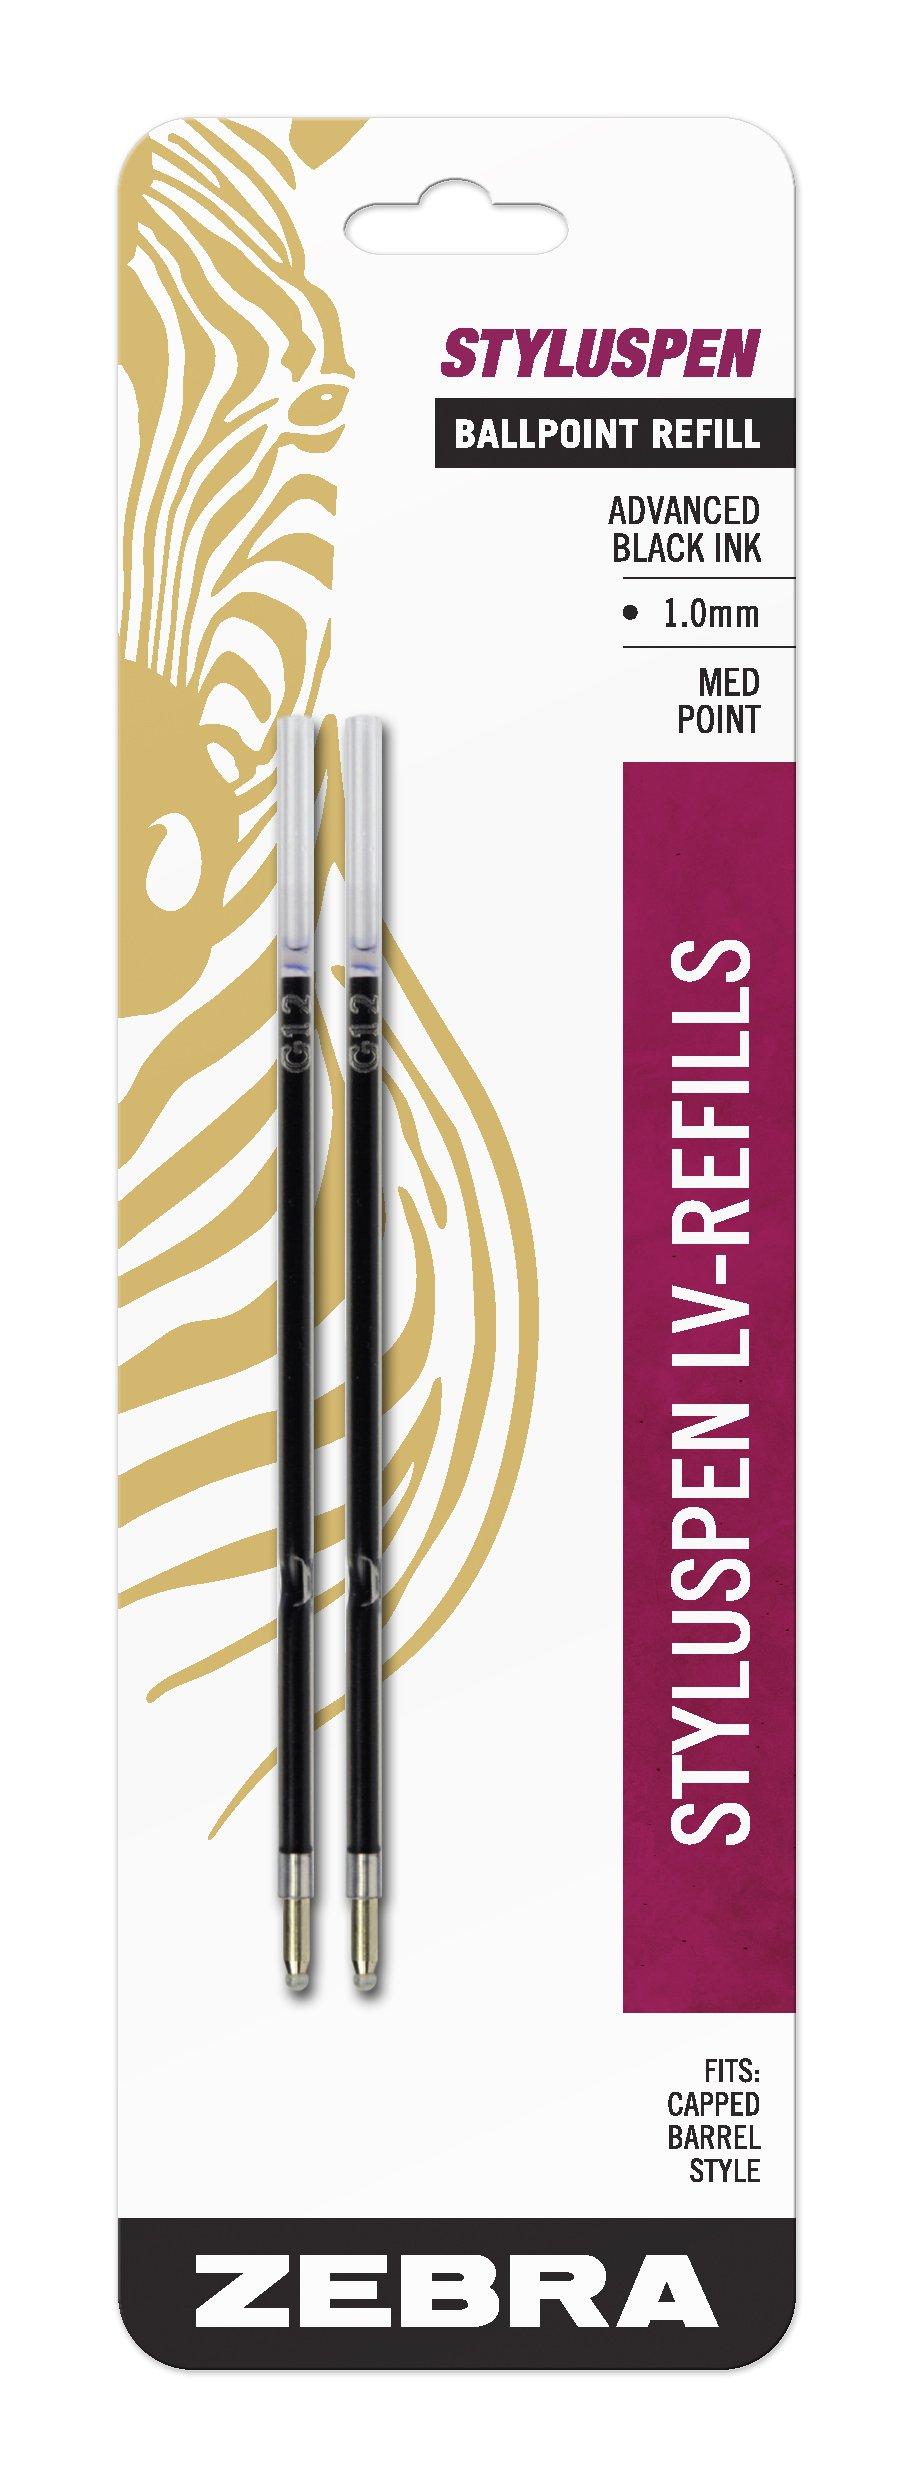 2 Repuestos de lapiceras 1.0mm tinta negra Marca Zebr ()